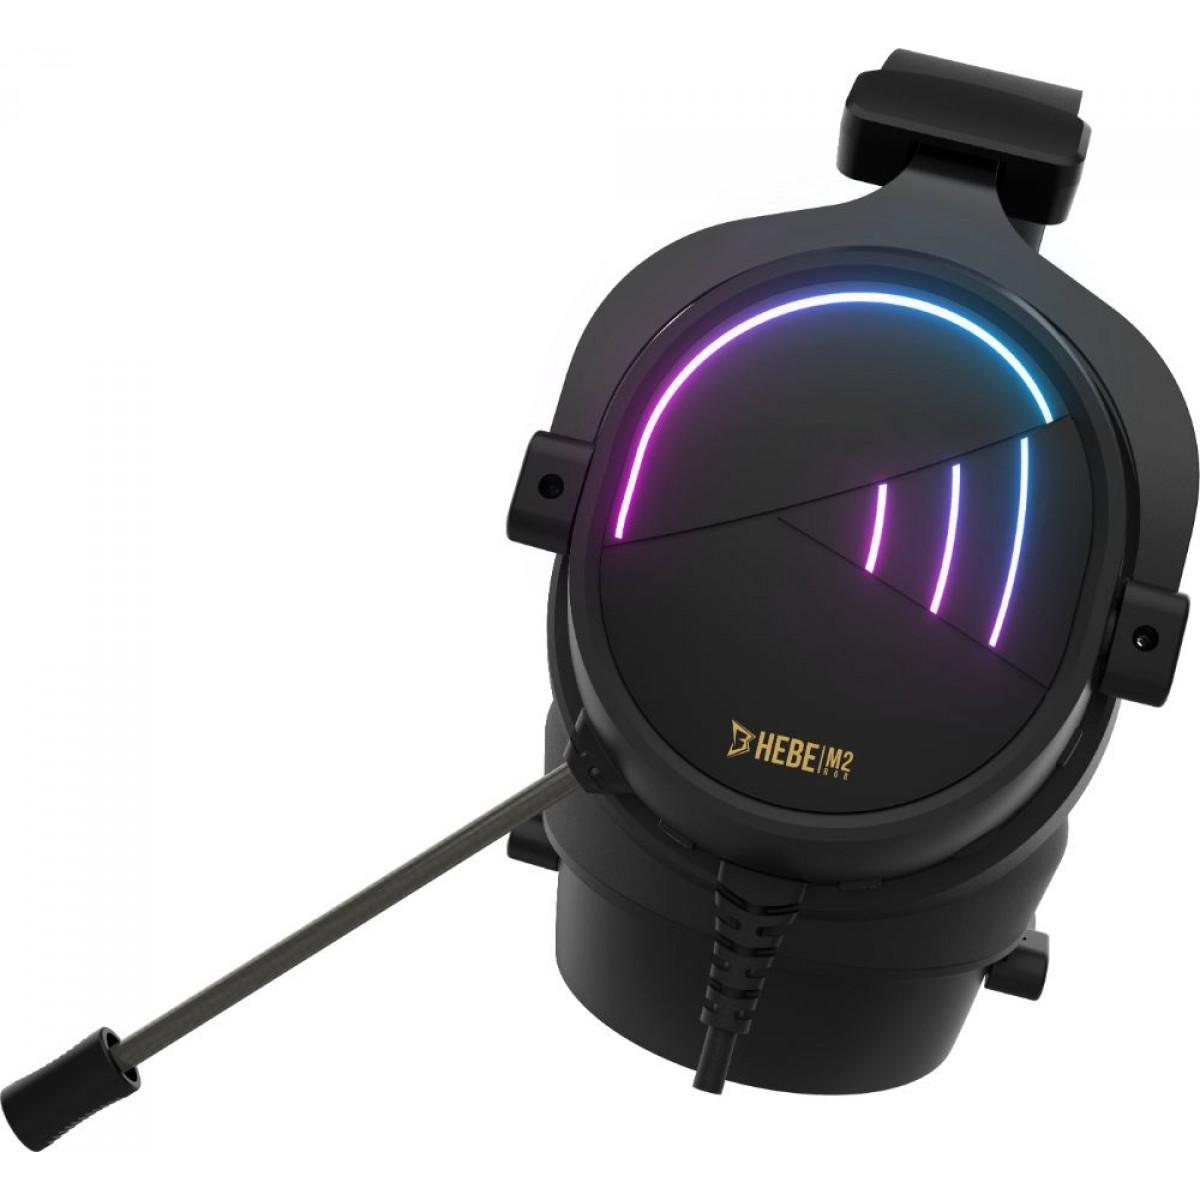 Headset Gamer Gamdias Hebe M2, Surround 7.1, RGB, Vibração, Black